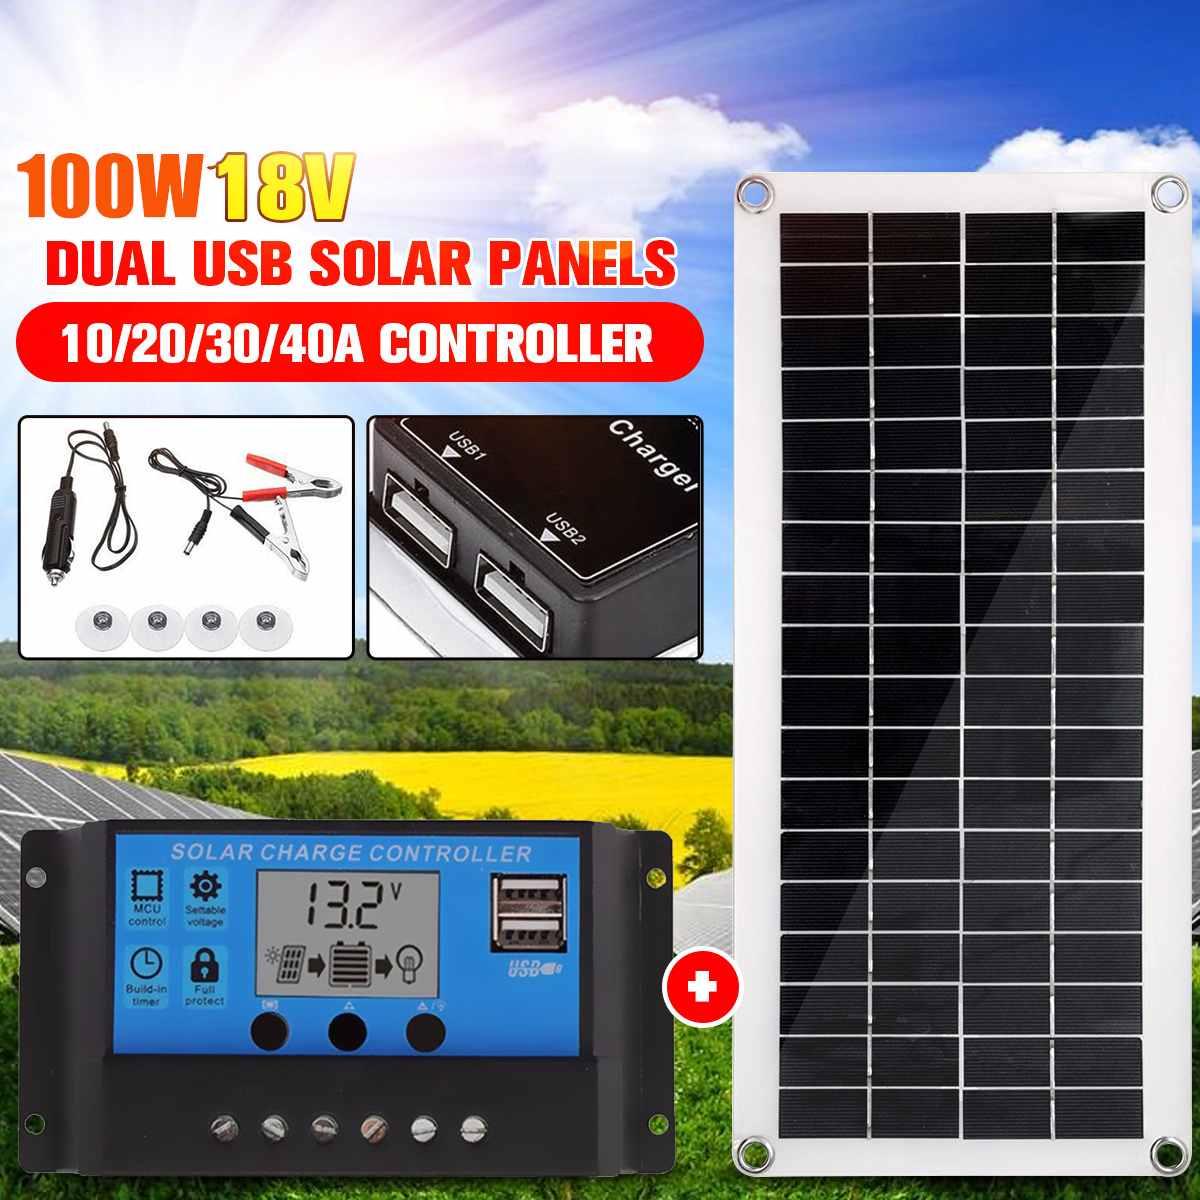 100w 18v portátil painel solar duplo usb power bank board bateria externa de carregamento solar célula placa clipes crocodilo carro carregador